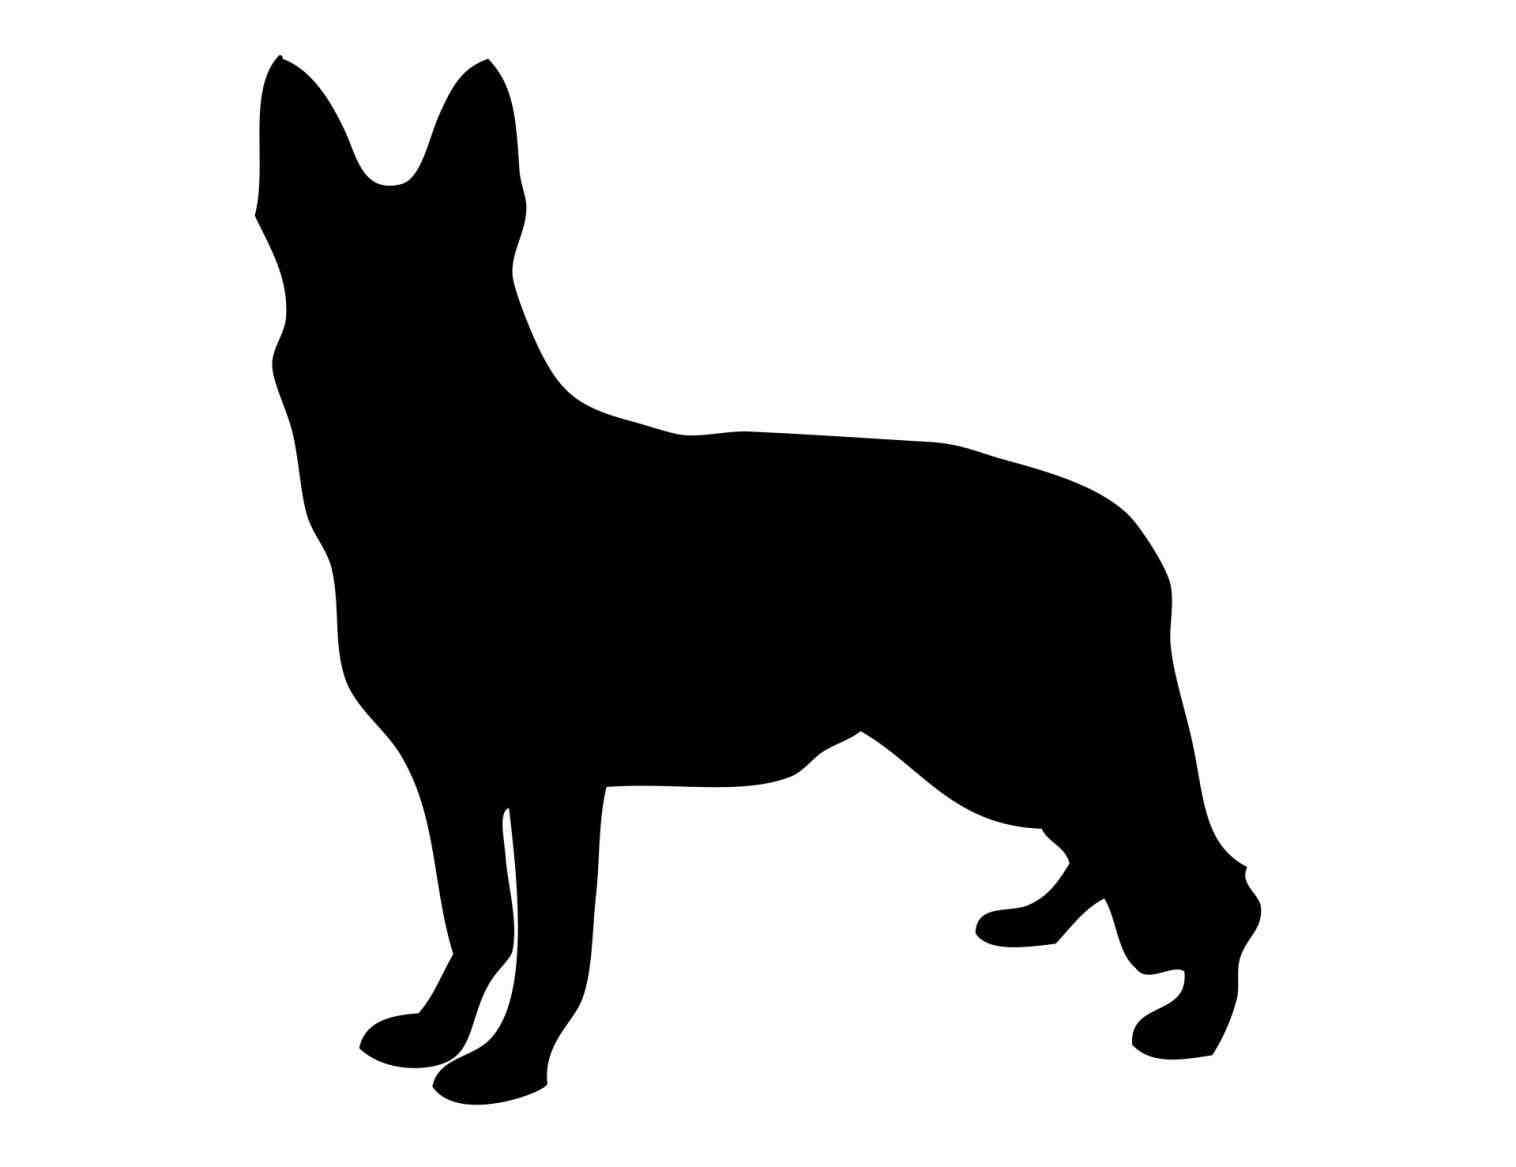 1516x1167 French Bulldog Sitting Silhouette Bulldog Silhouettes Royalty Free